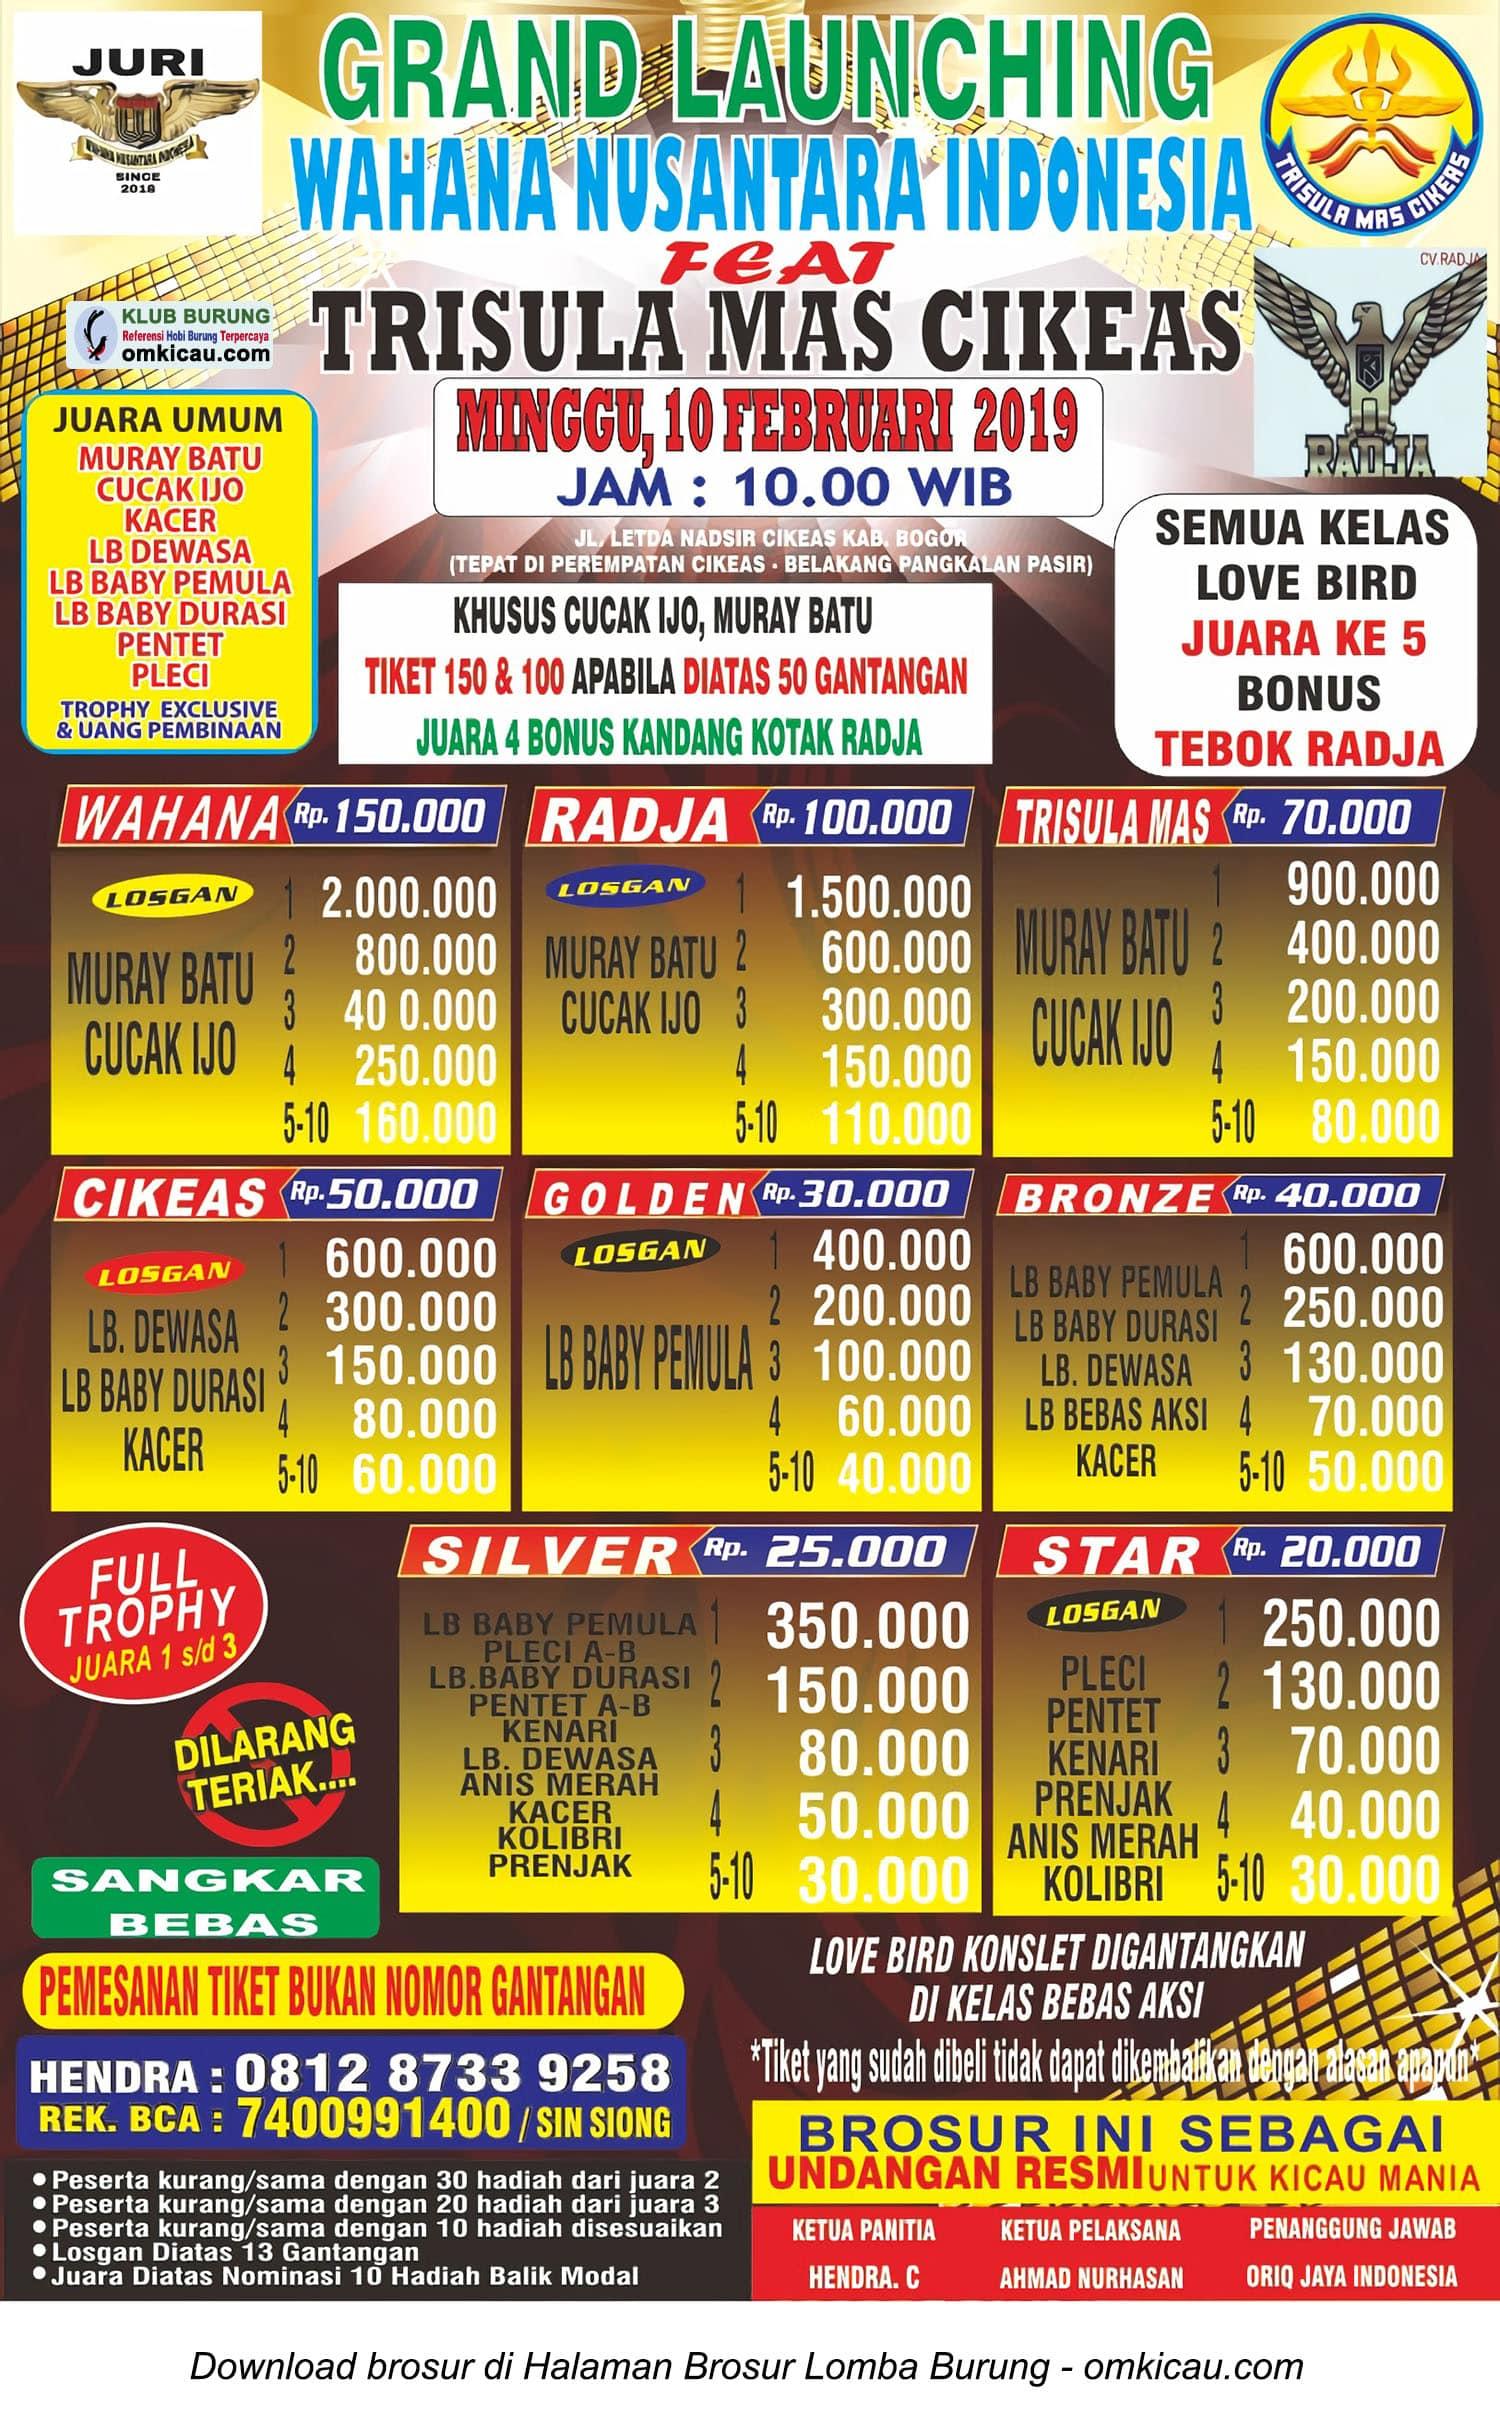 Wahana Nusantara Indonesia